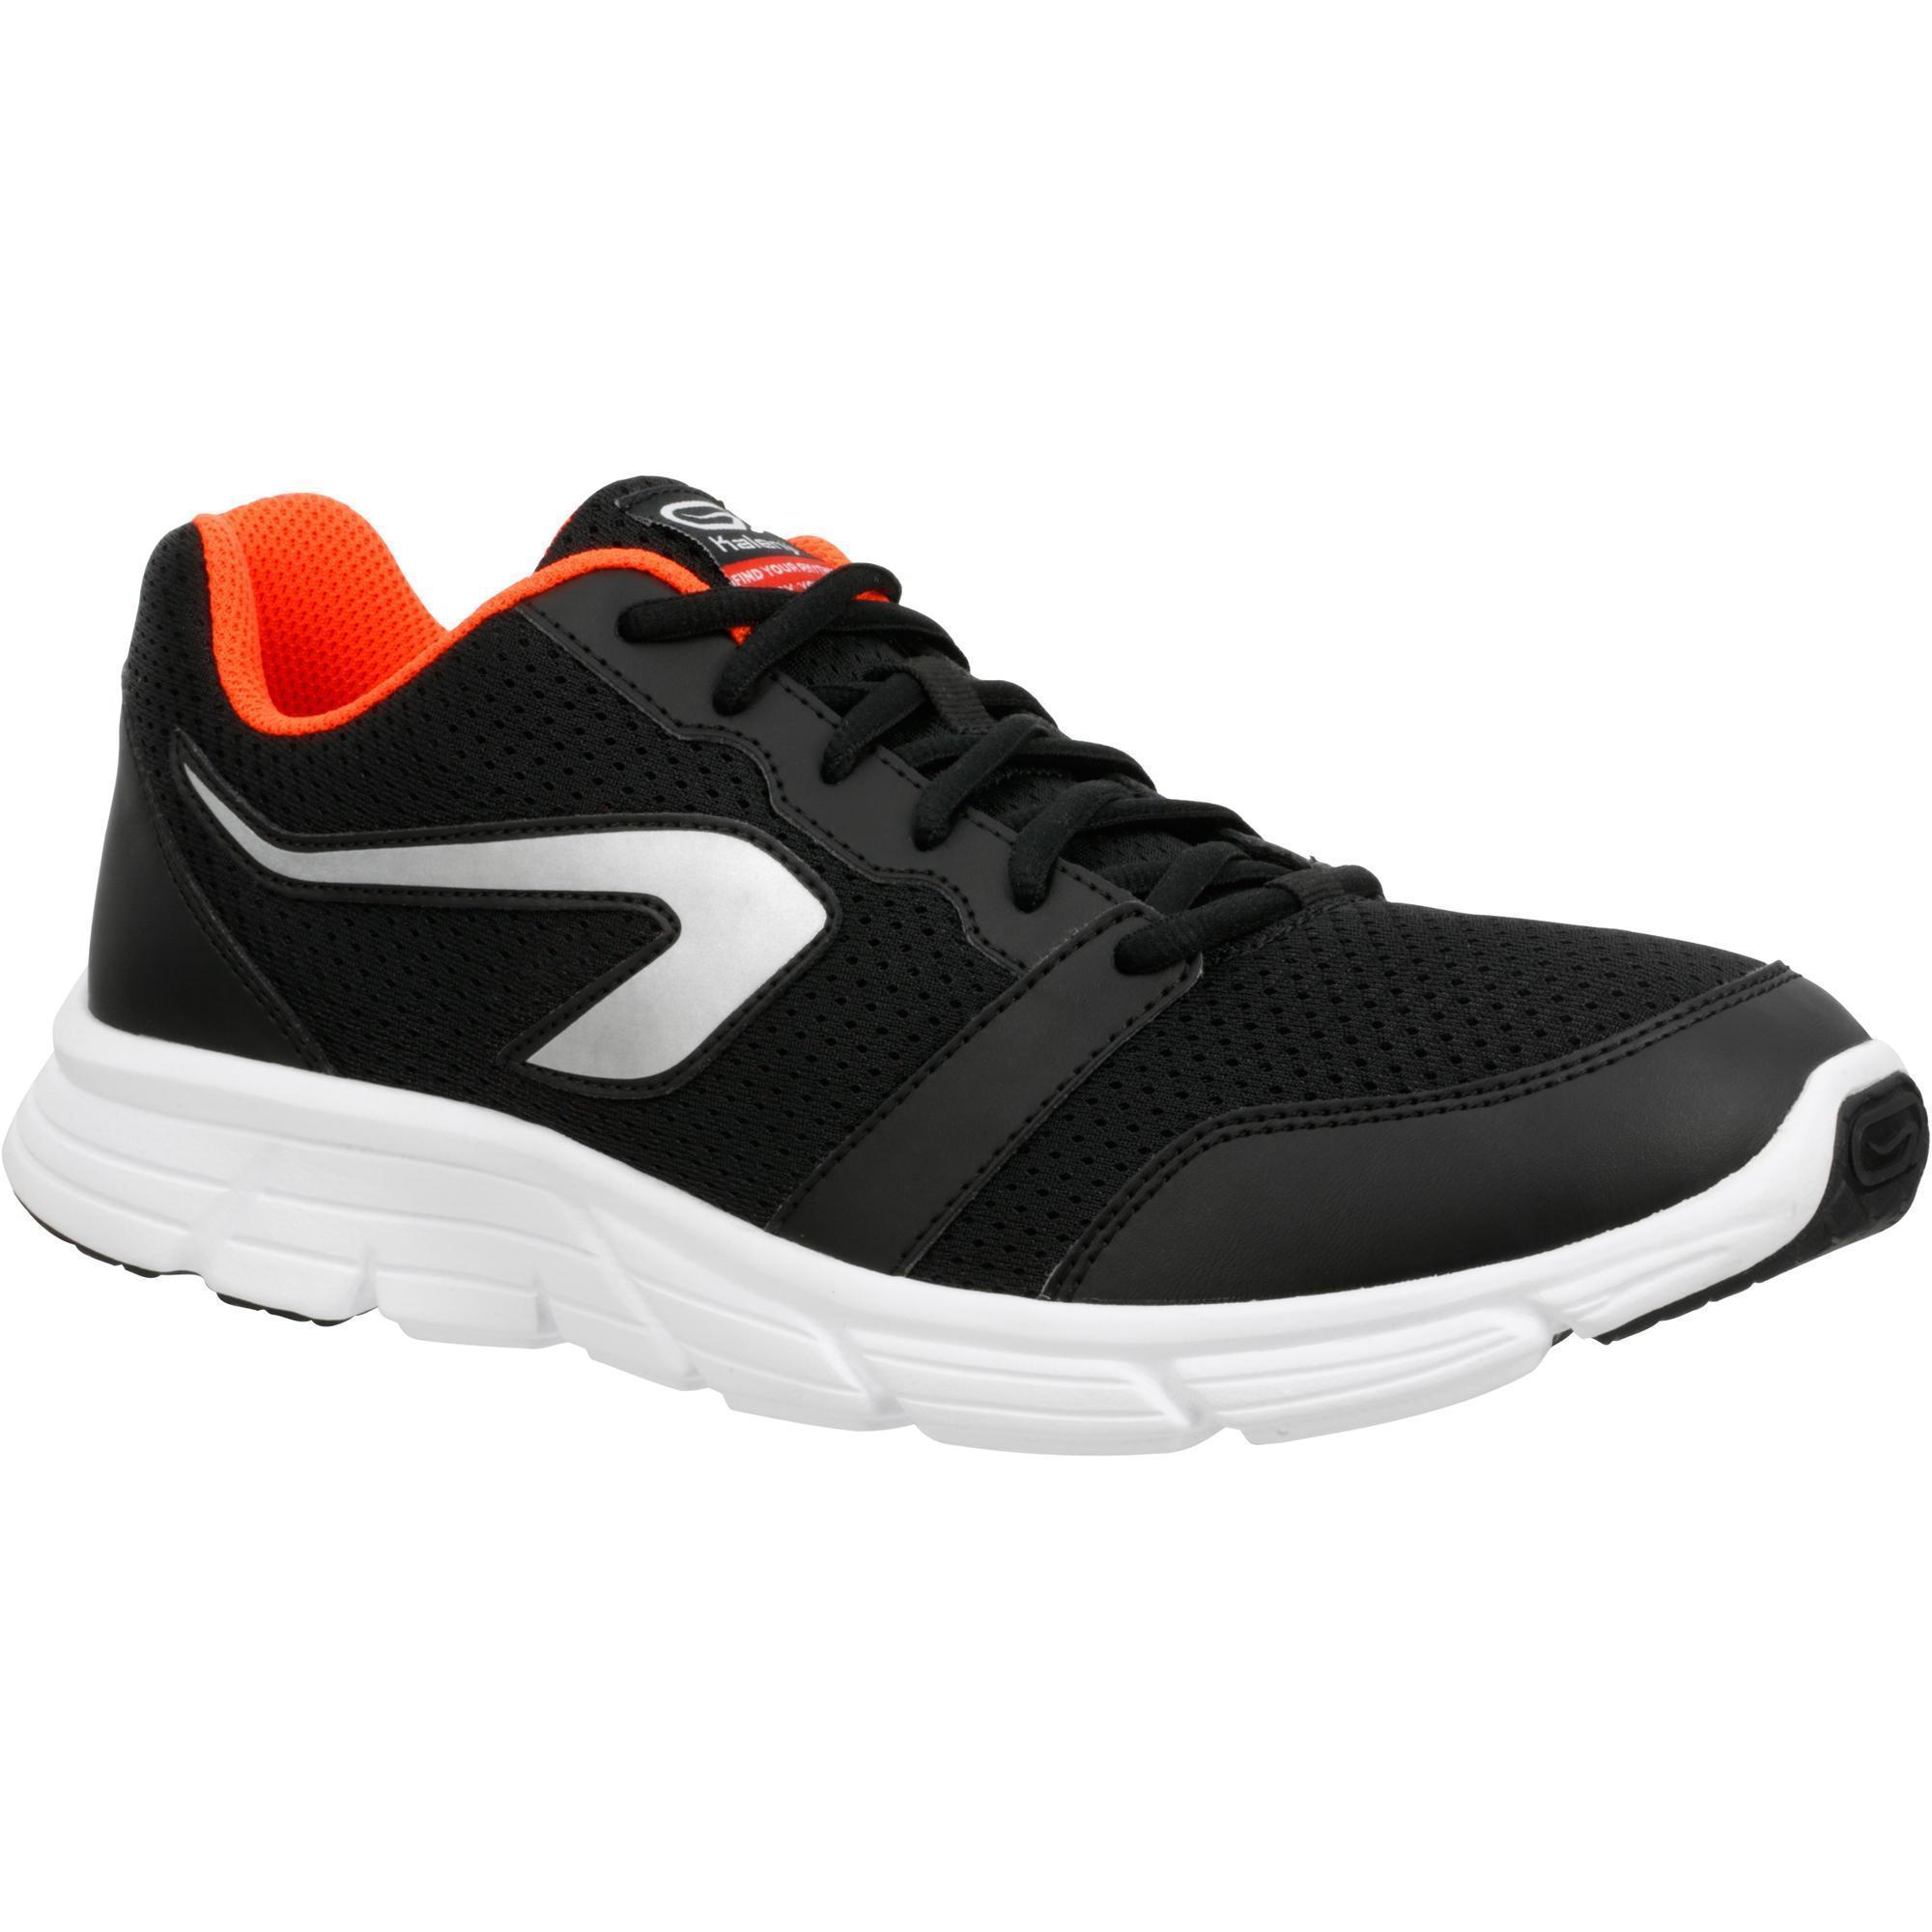 Chaussures running pour tapis course - Chaussure pour tapis de course ...